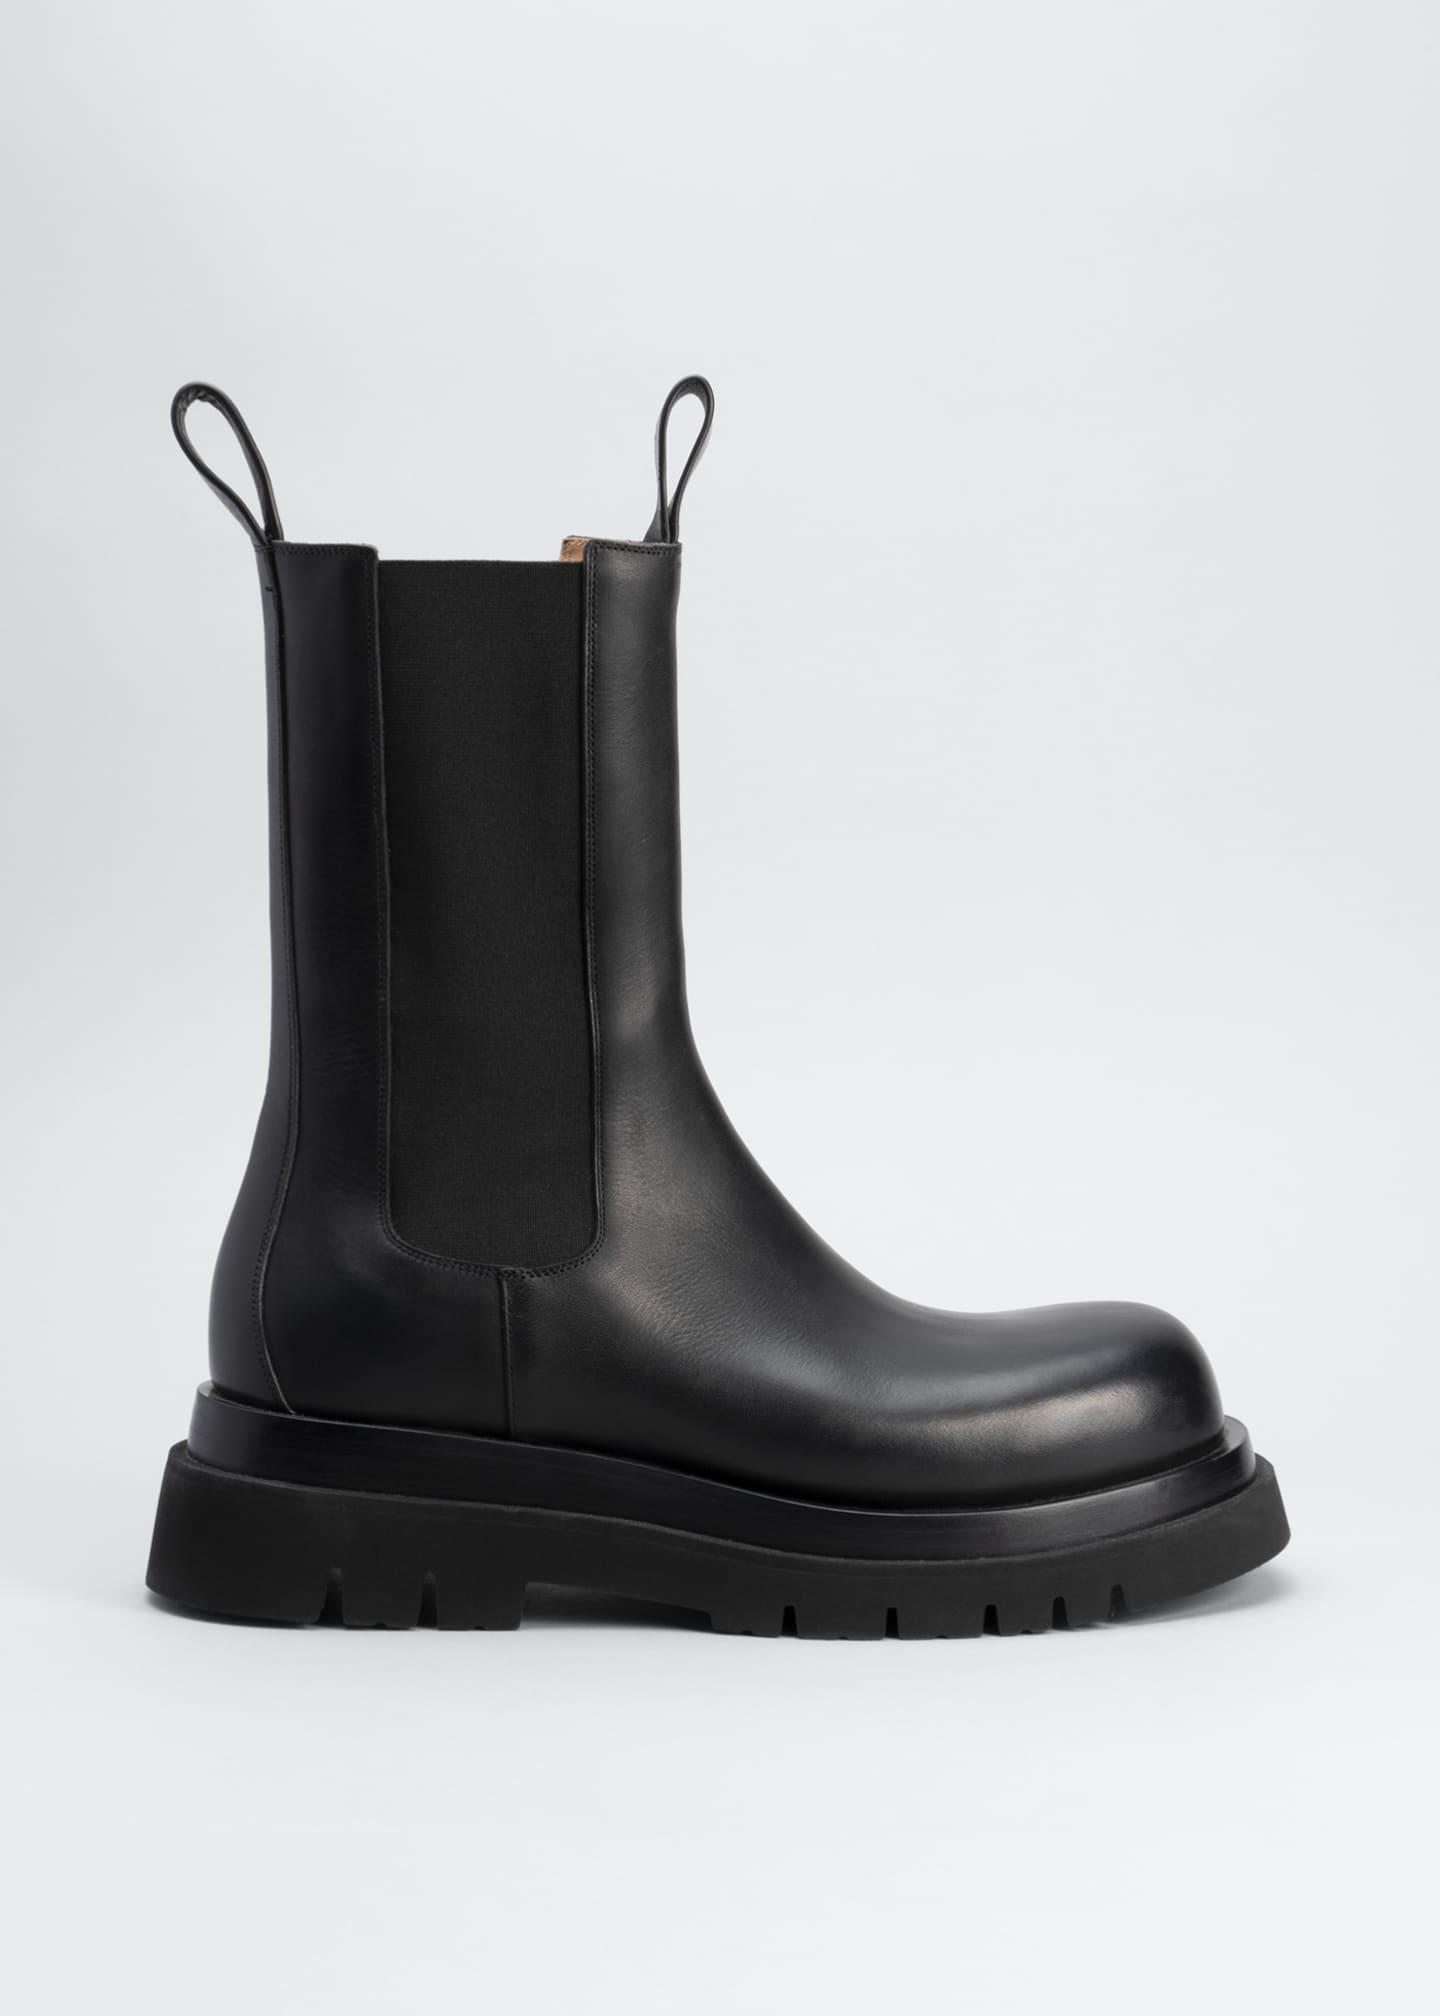 Flat Chelsea Combat Boots by Bottega Veneta, available on bergdorfgoodman.com for $1 Irina Shayk Shoes Exact Product